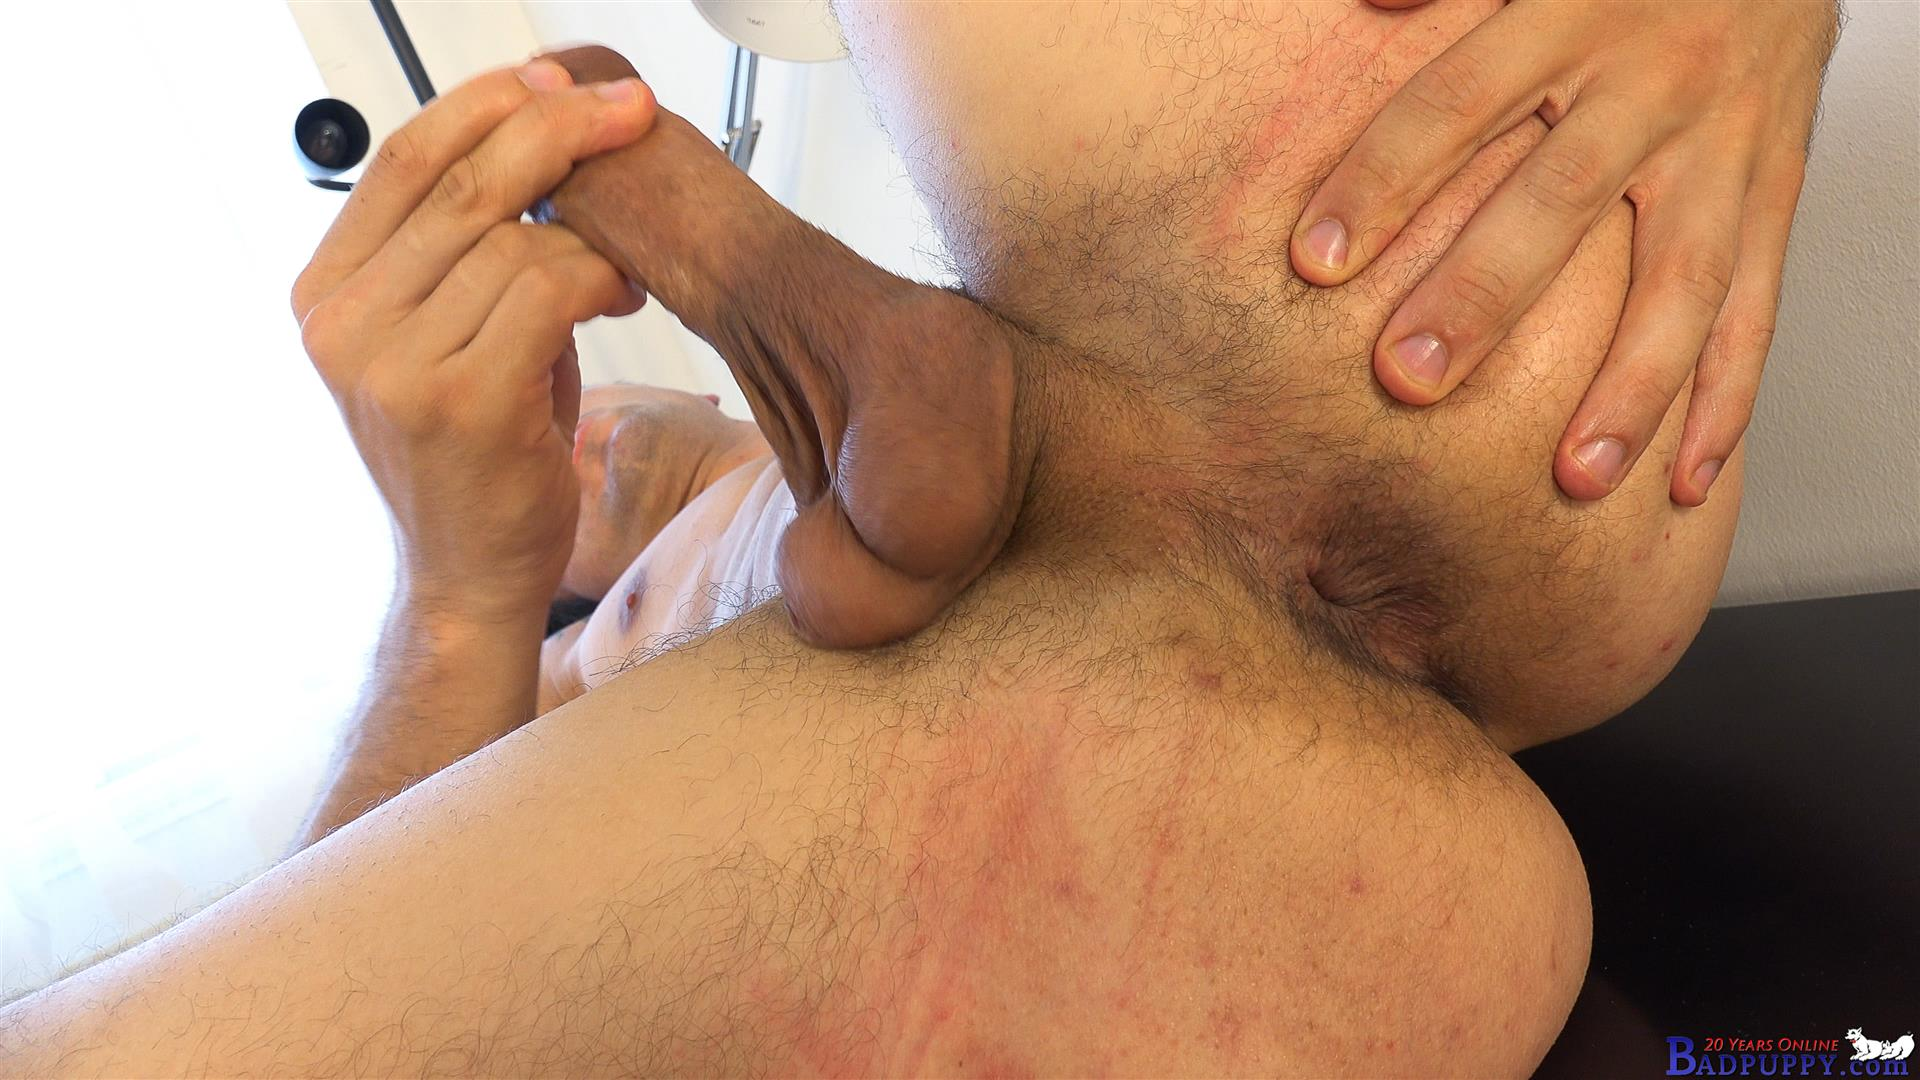 Badpuppy Milan Pis Straight Guy With Big Uncut Cock Masturbating Amateur Gay Porn 11